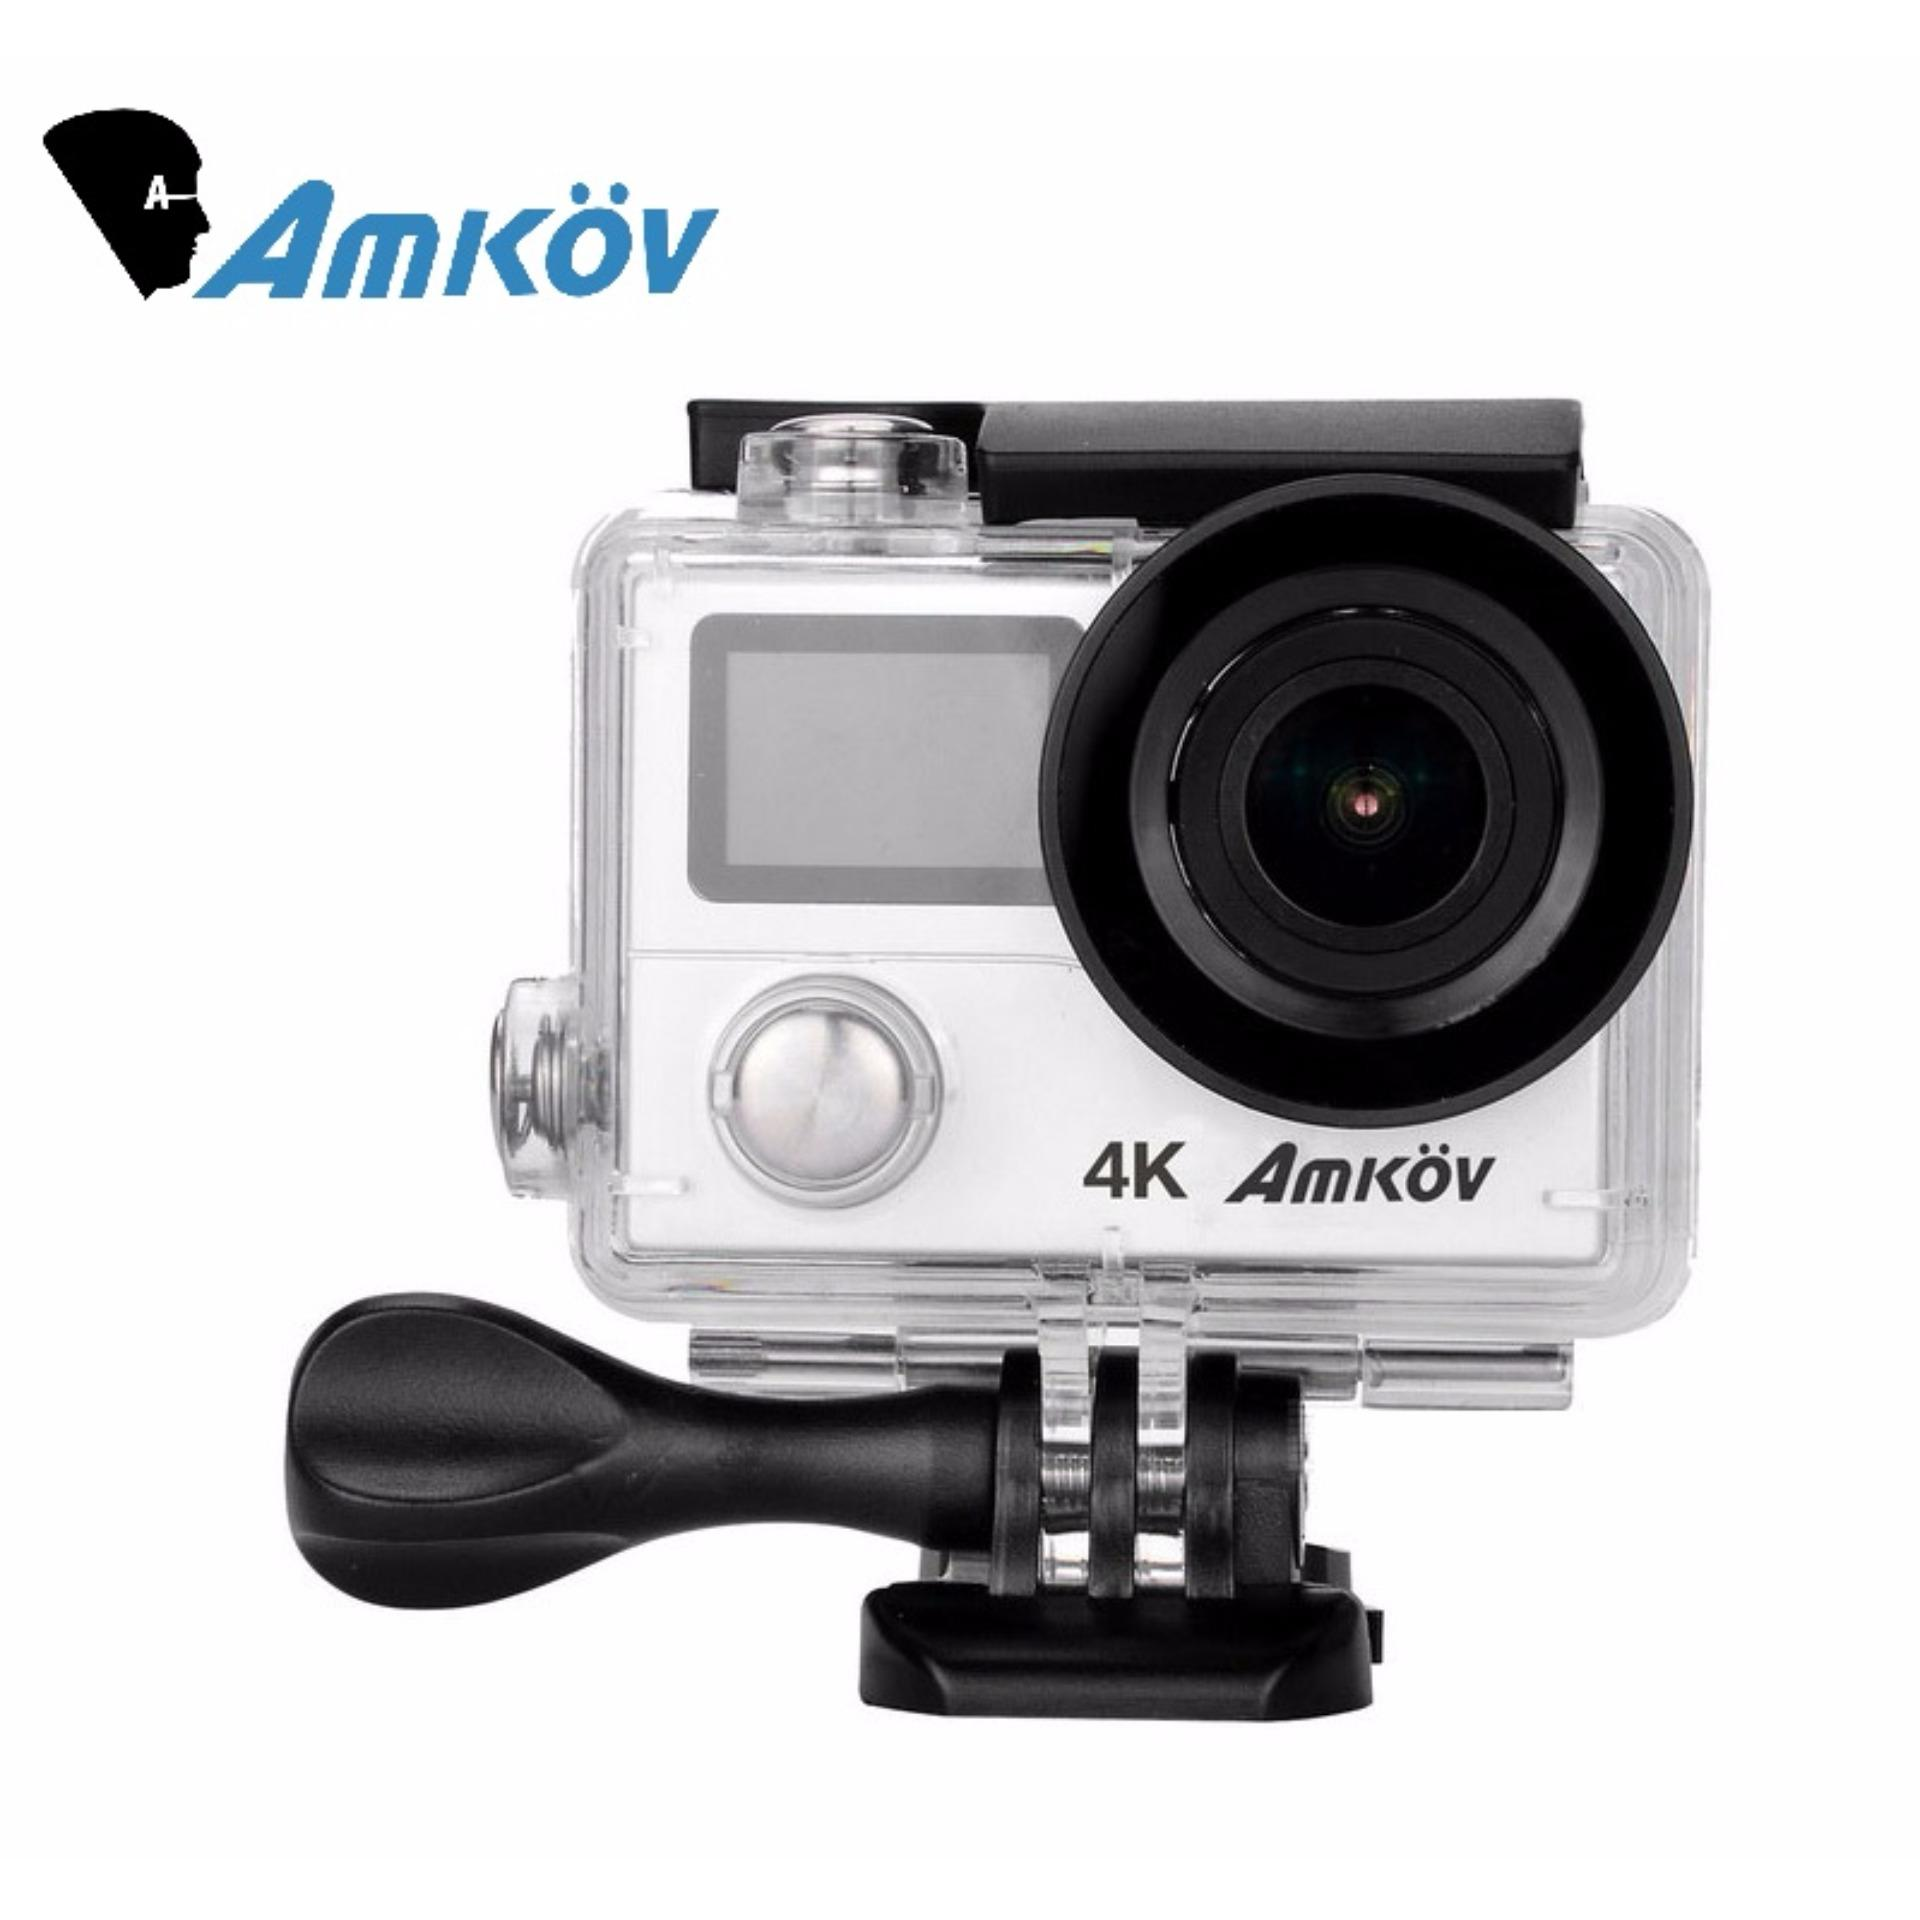 AMKOV AMK8000S 4K Action Camera Wifi 1080P/60FPS *FREE EXTRA BATTERY*